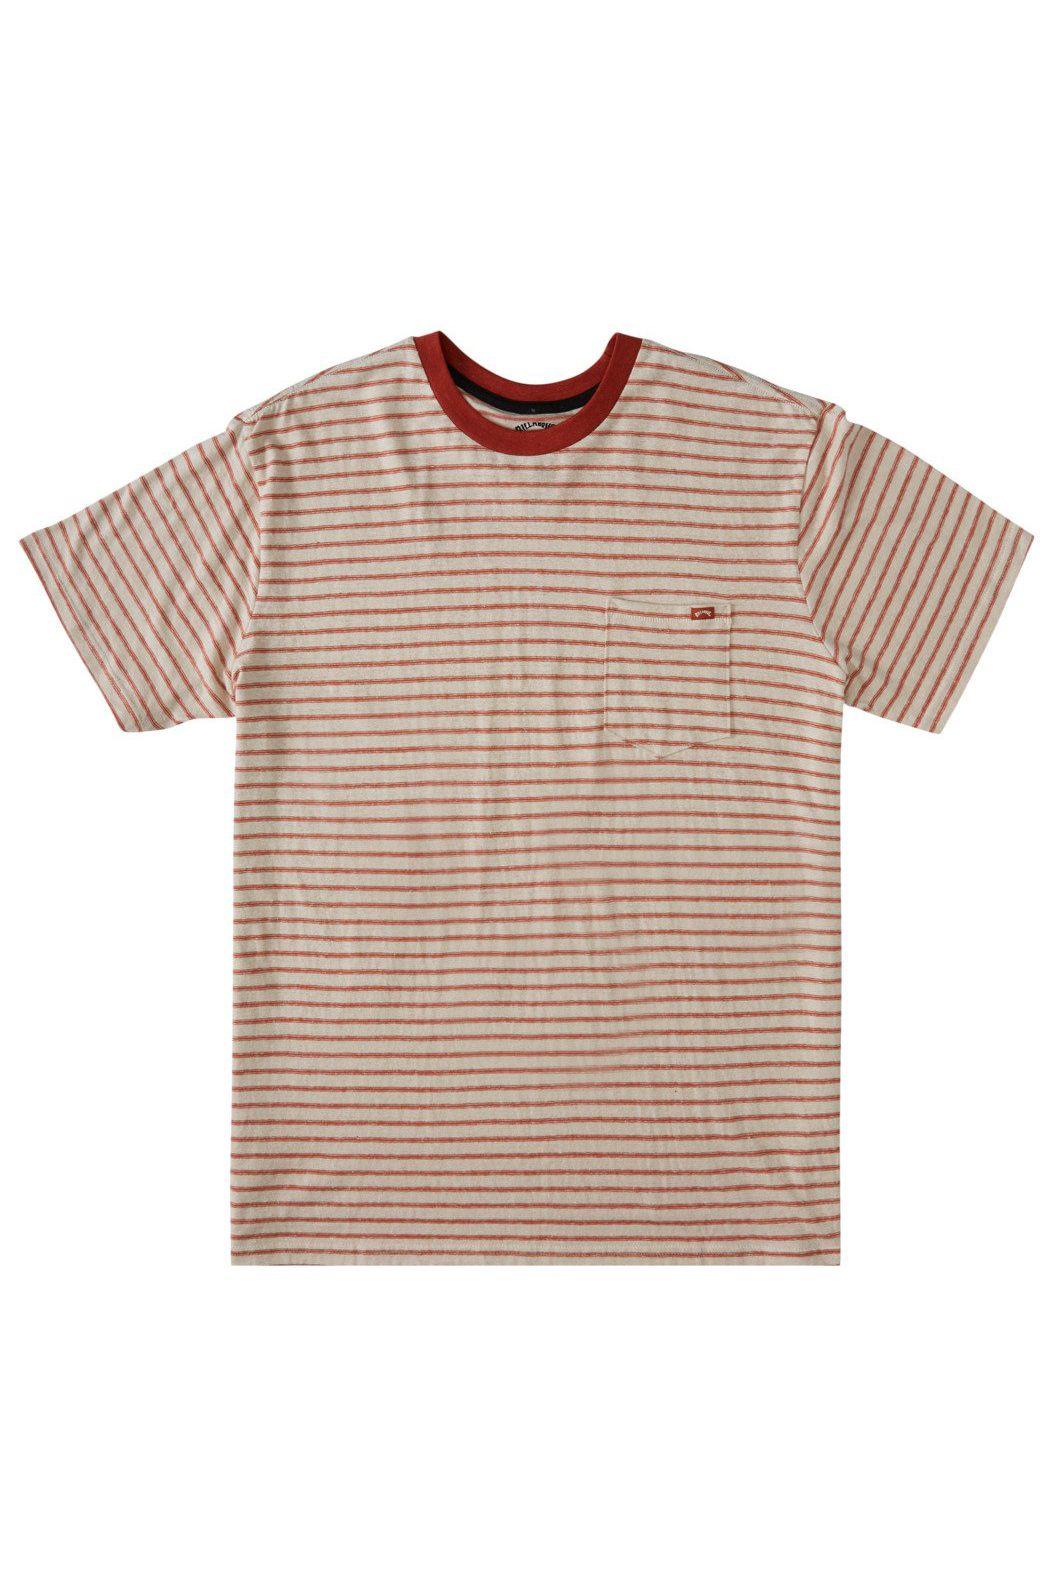 Billabong T-Shirt ELDORADO HEMP STRIPE ADVENTURE DIVISION Auburn